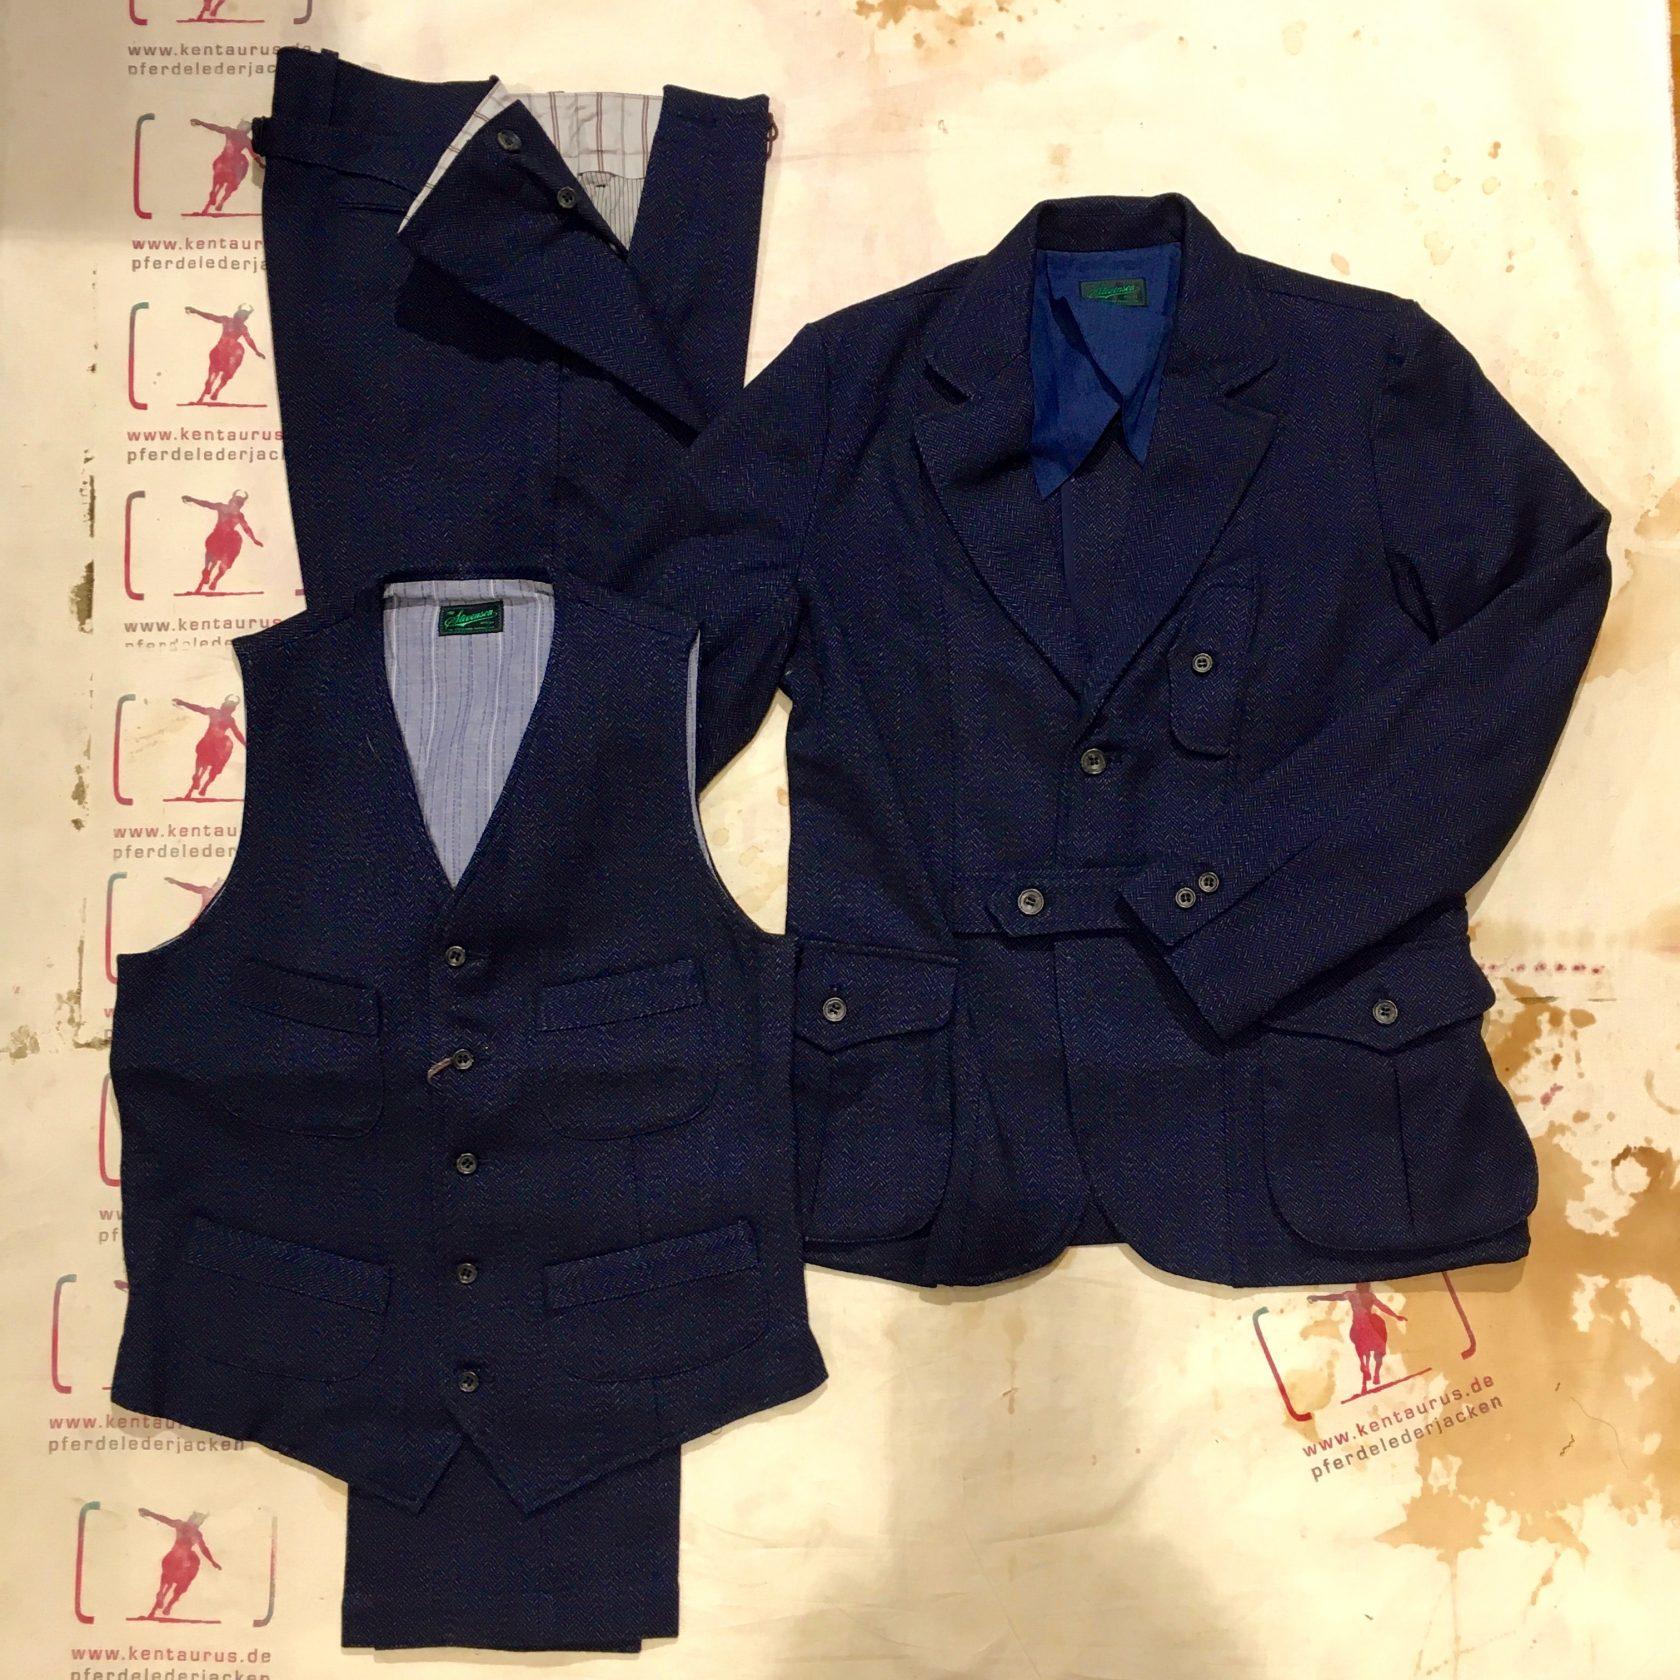 Stevenson Overall AW16 huntsman 3 piece suit